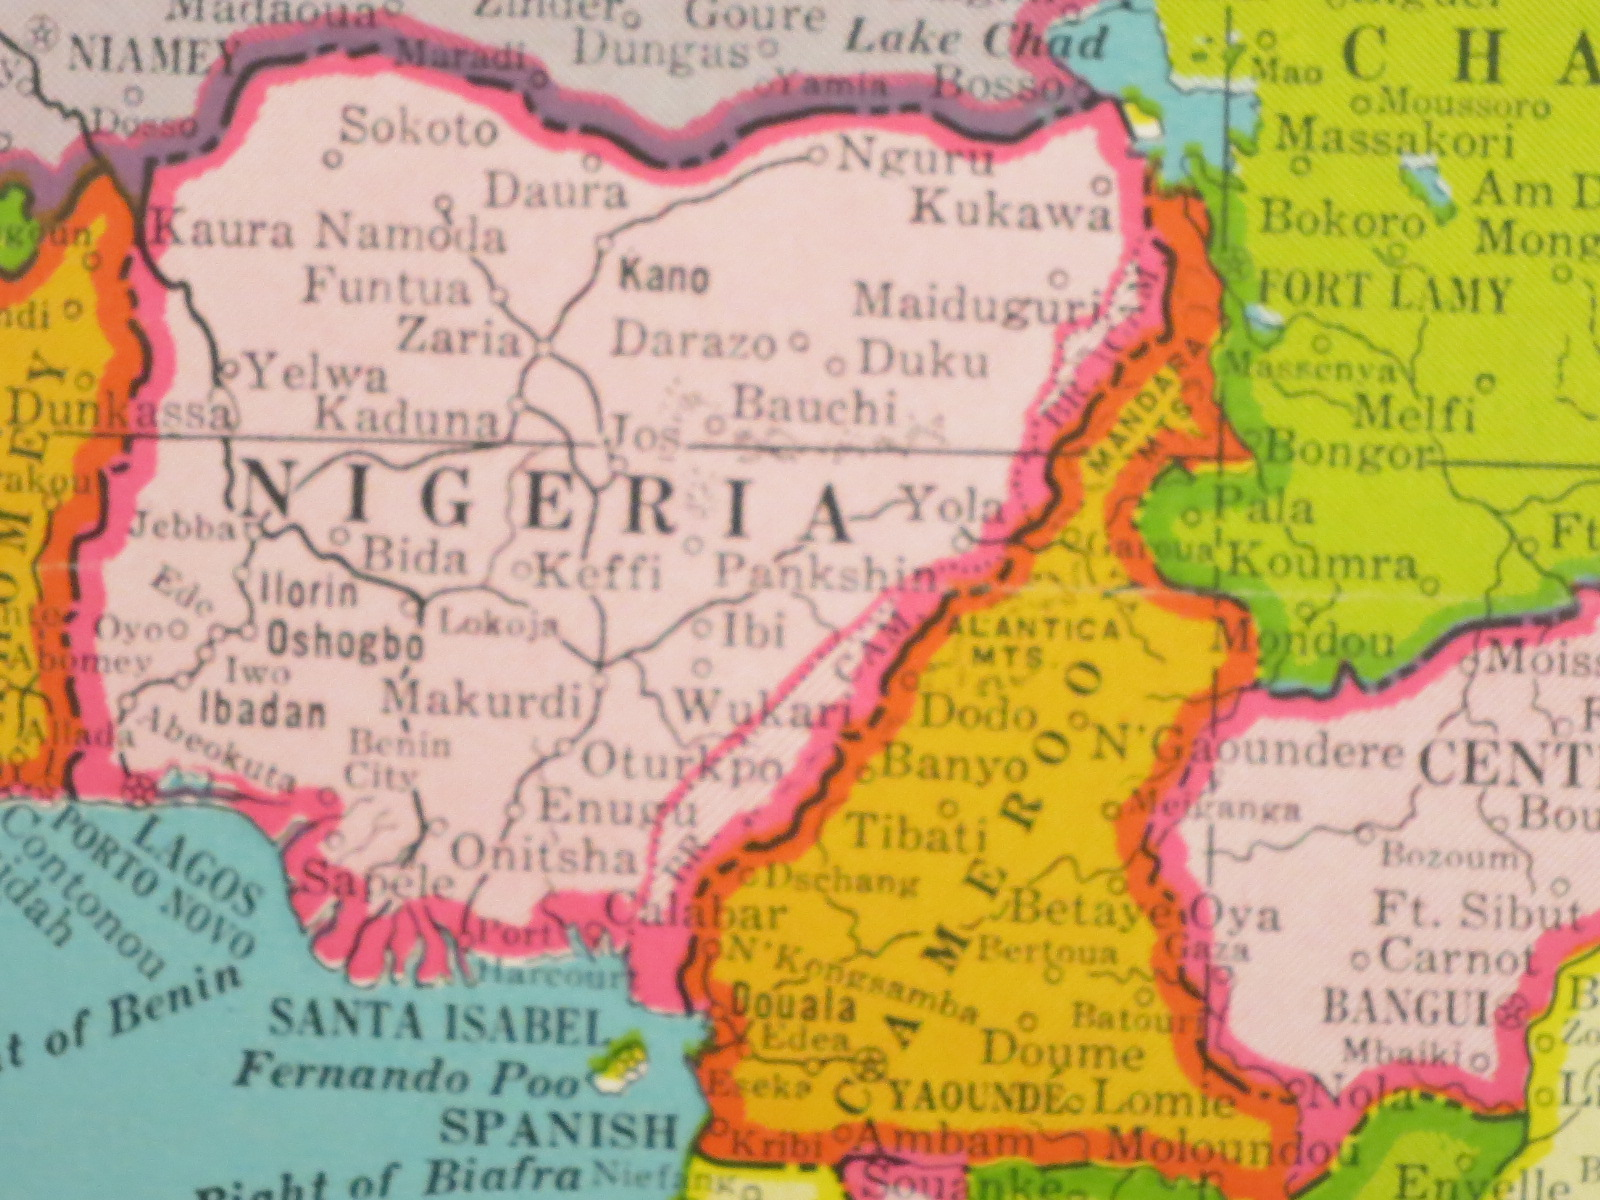 Nigeria and Cameroon, 1960 | Map Liry - University of ... on côte d'ivoire map, estonia map, grenada map, monaco map, gambia map, saudi arabia map, rwanda map, madagascar map, ghana map, egypt map, mali map, sudan map, namibia map, croatia map, tunisia map, congo map, algeria map, thailand map, kenya map, angola map, liberia map, cape verde map, morocco map, gabon map, uganda map, africa map, libya map, nigeria map, senegal map, malawi map, ecuador map, comoros map, niger map, ethiopia map, mozambique map, zimbabwe map,